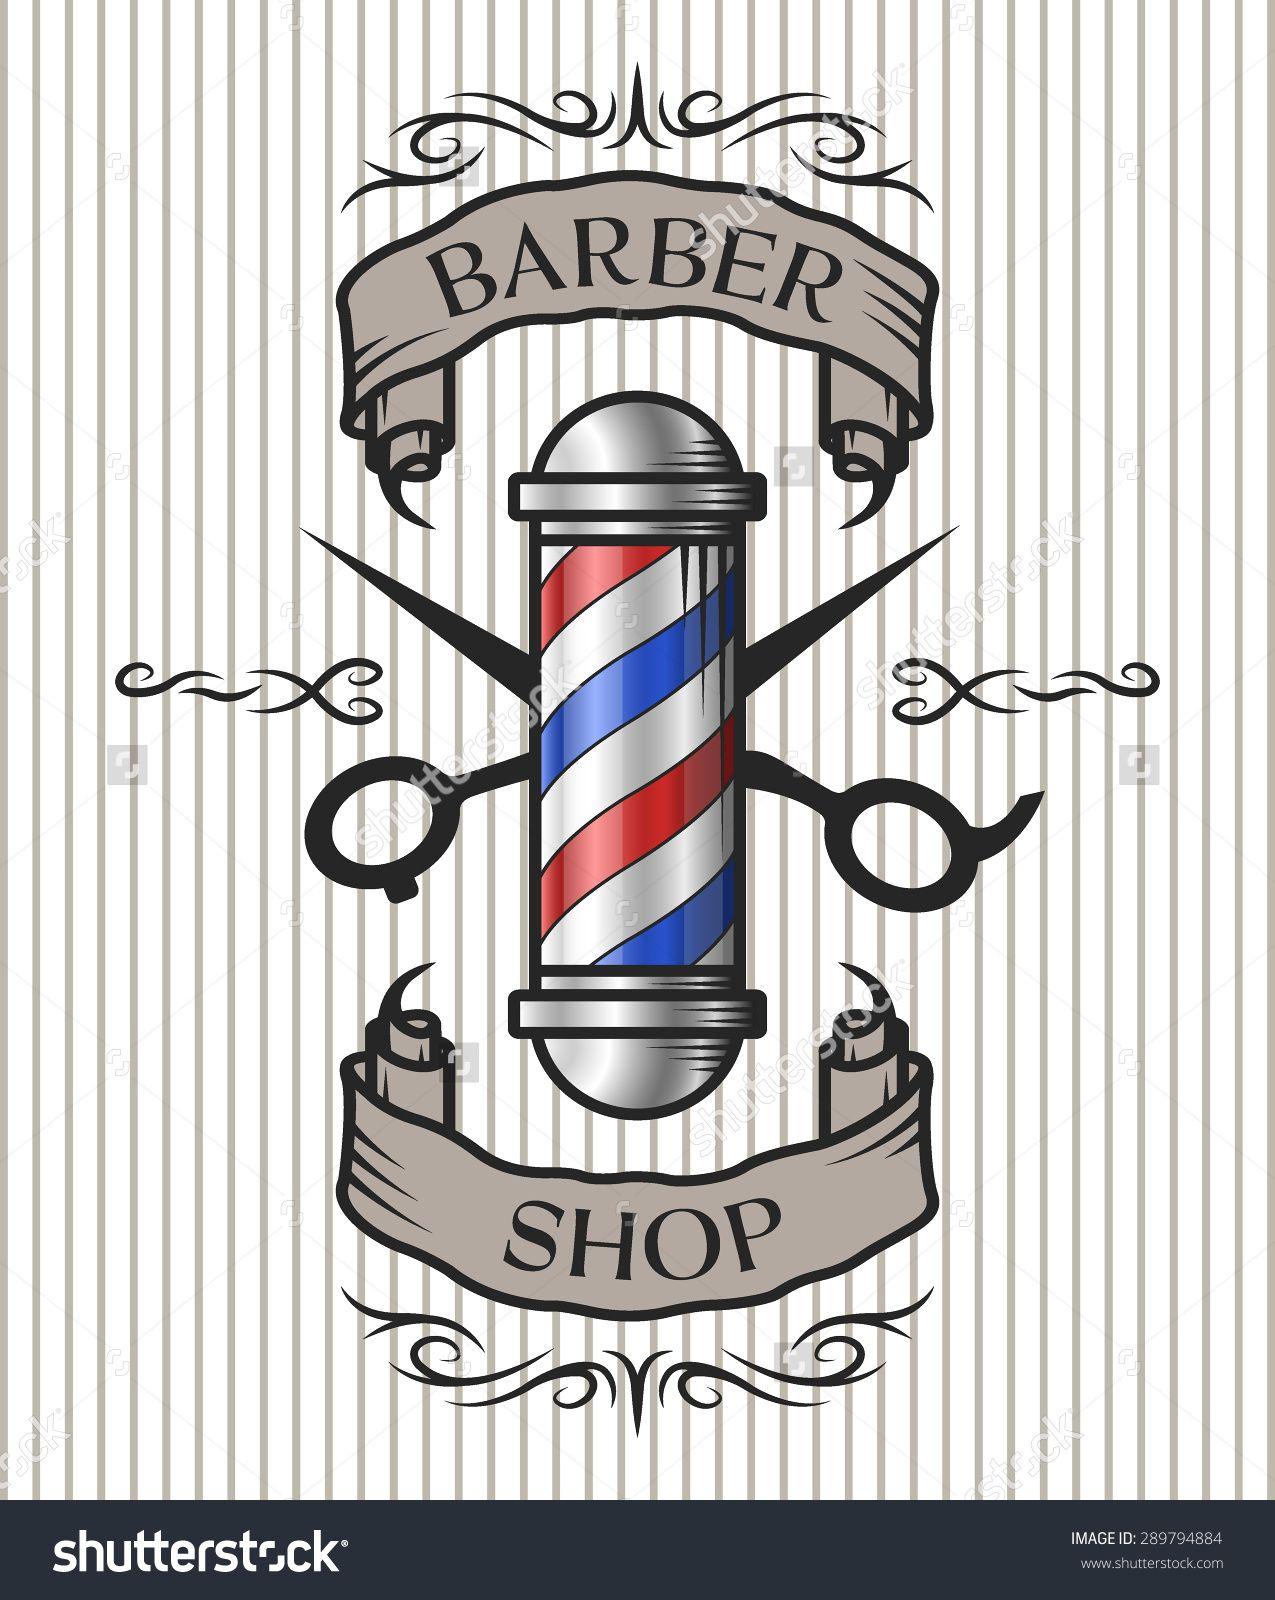 Stock Vector Barber Shop Emblem Barber Pole Scissors And Ribbon For Text In An Old Vintag Ideias Para Barbearias Quadros Para Barbearia Desenhos Para Barbearia